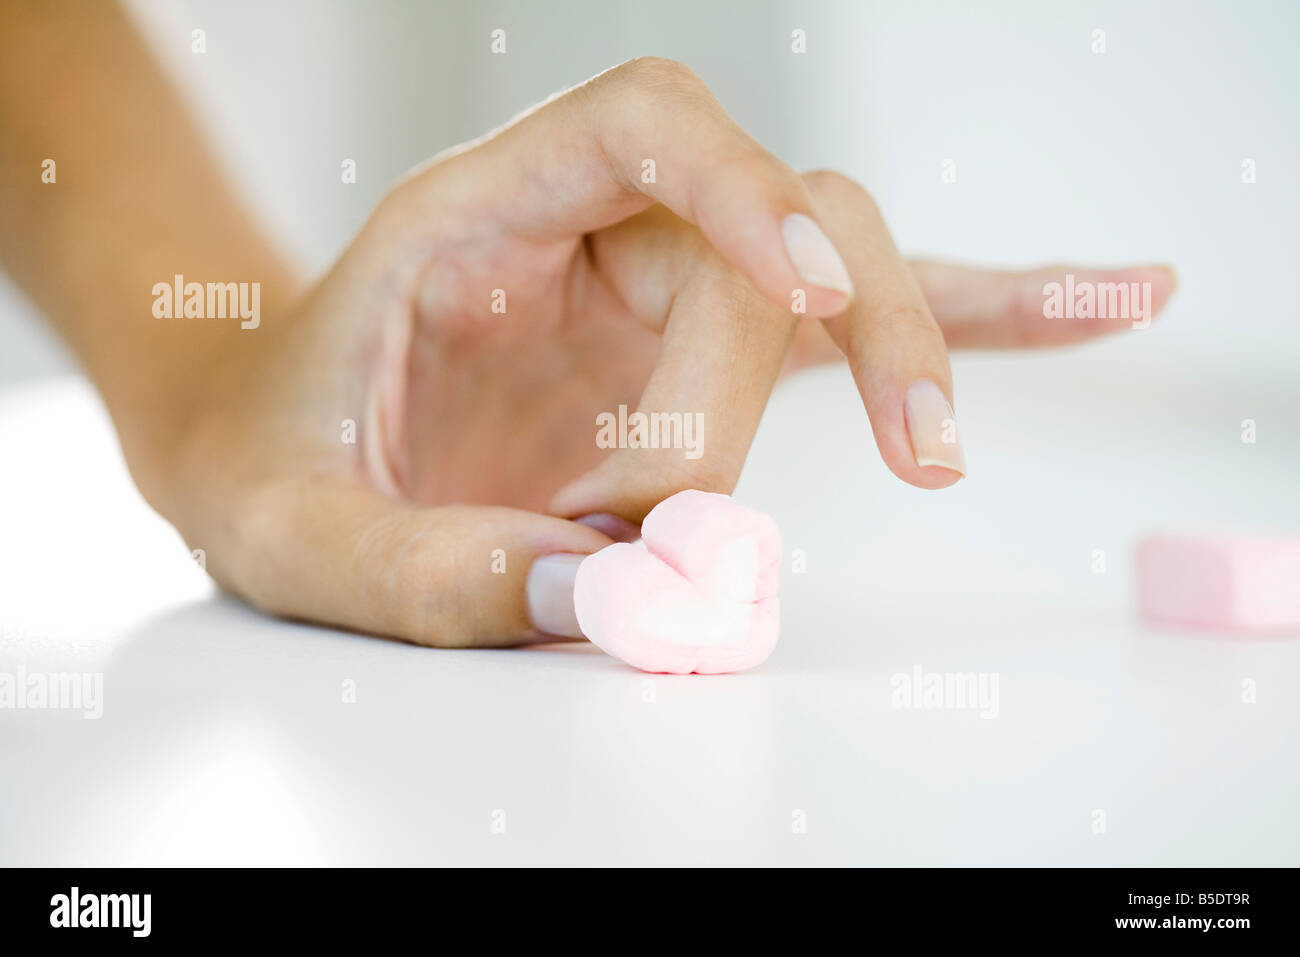 Woman's hand flicking marshmallow heart - Stock Image